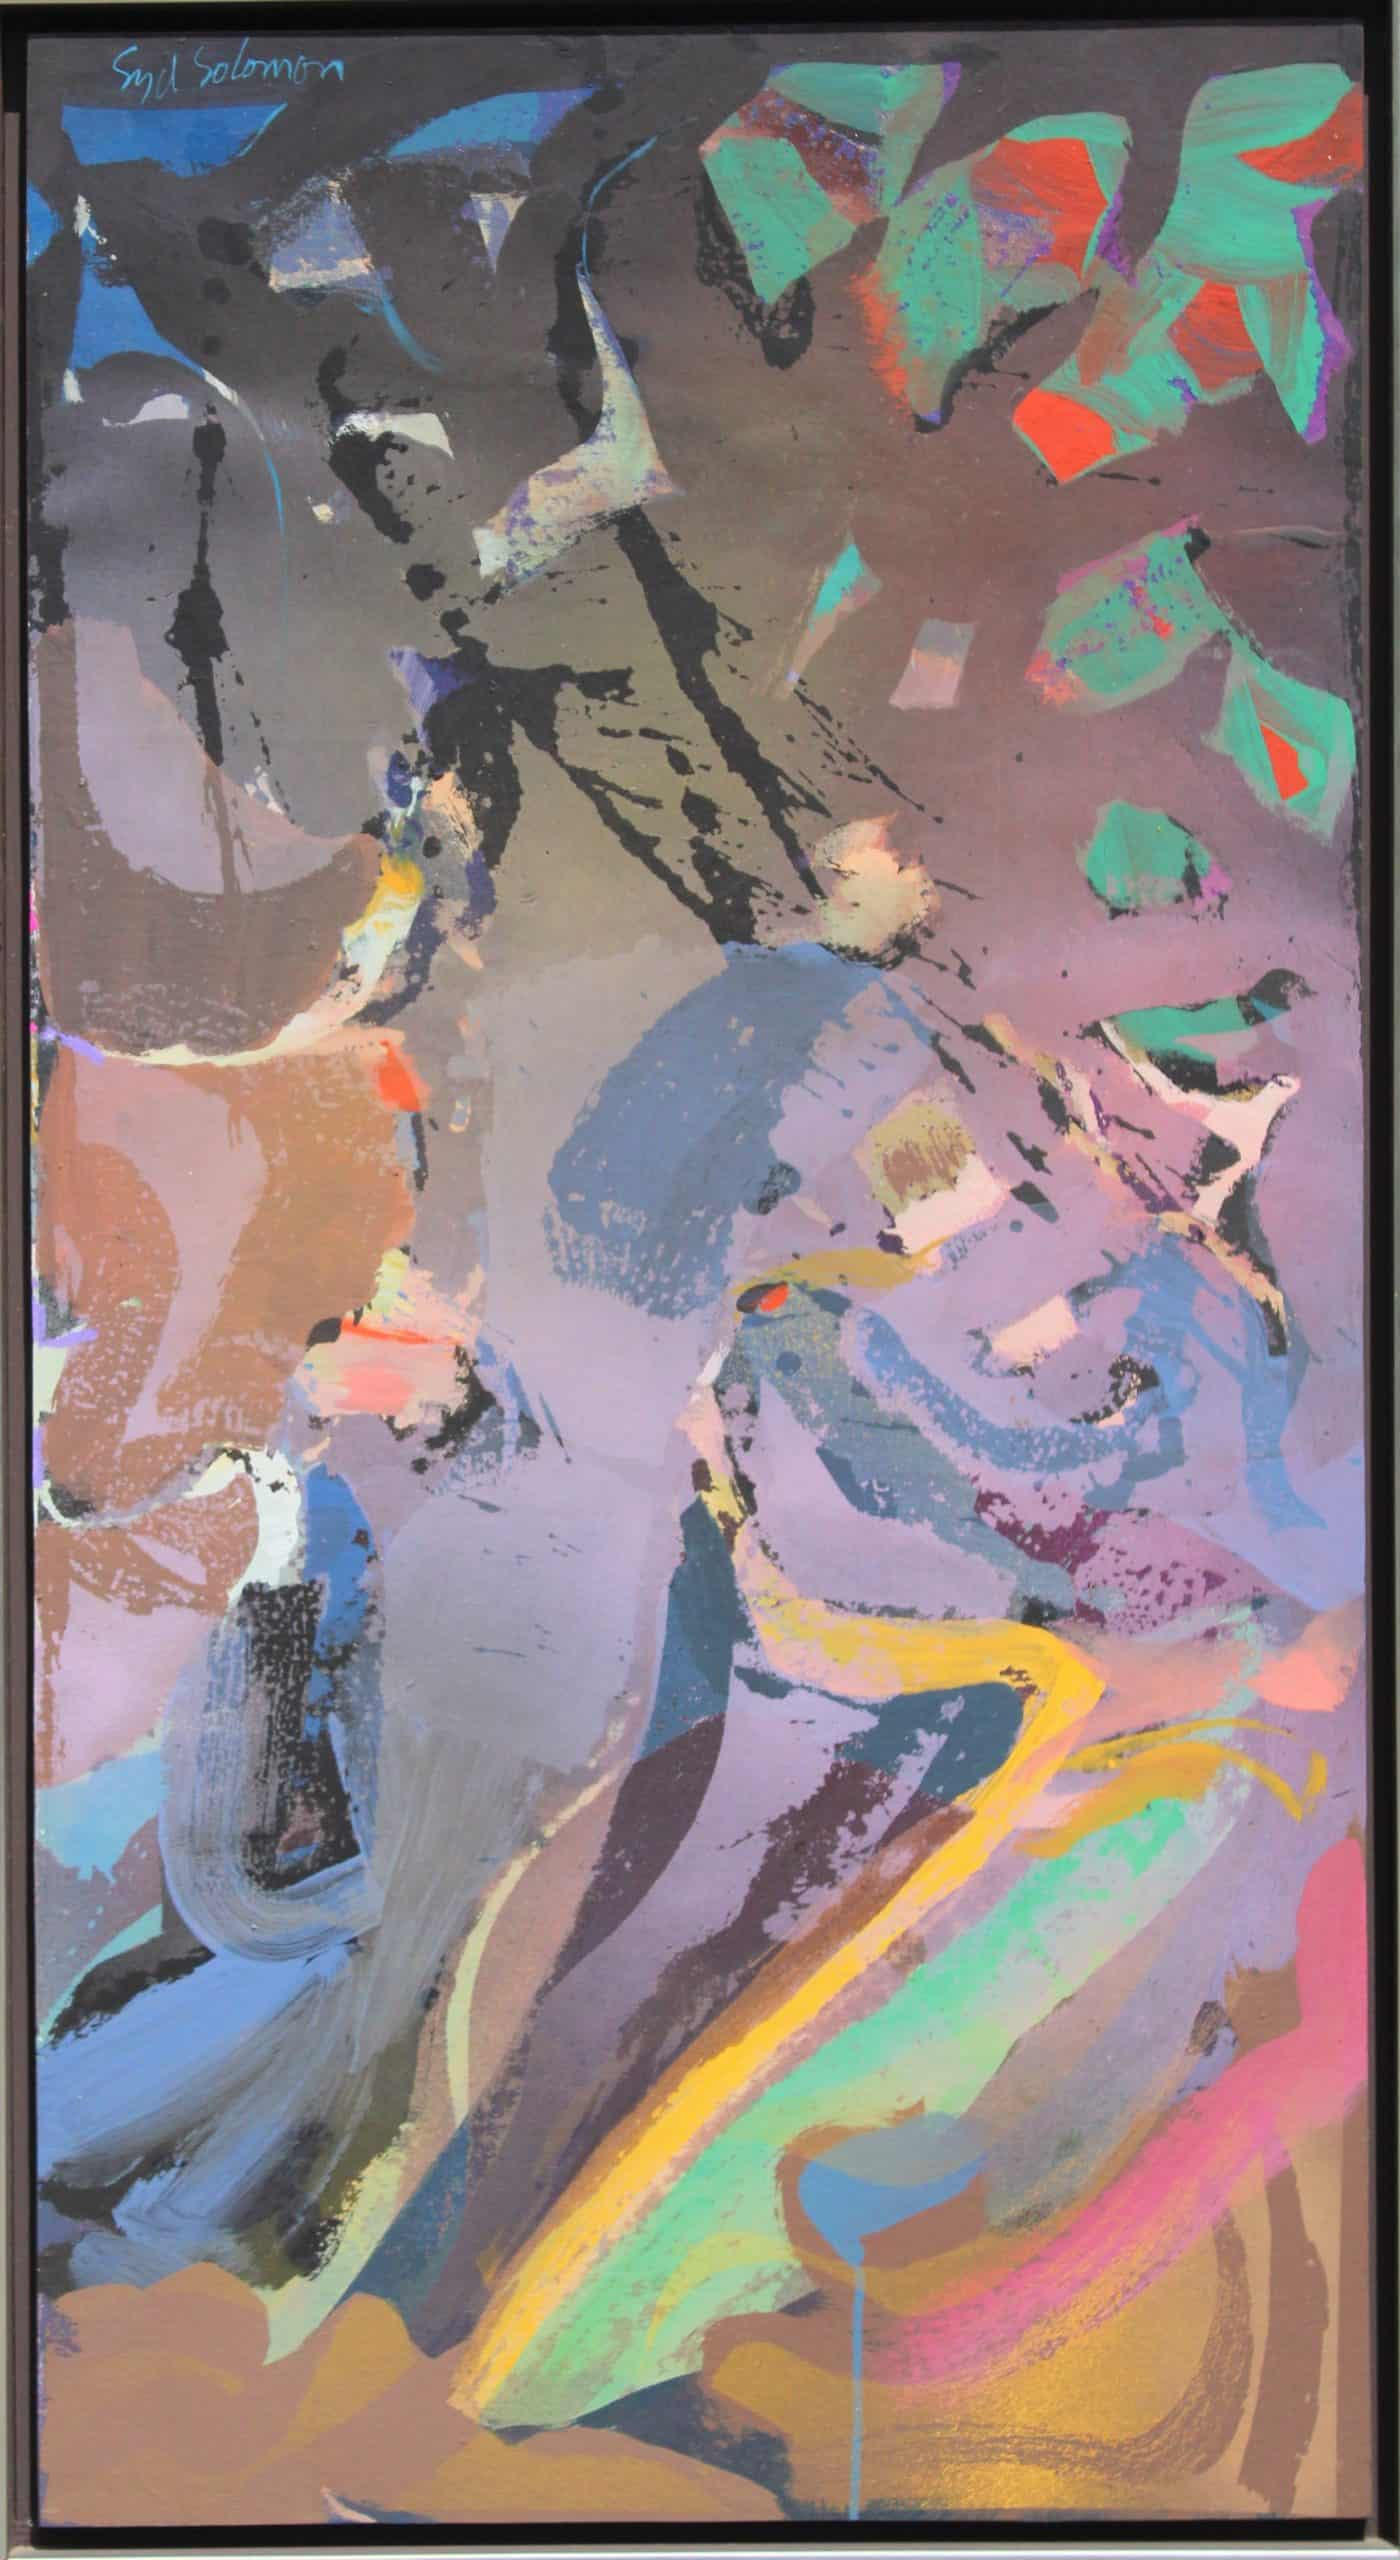 Syd Solomon (1917-2004) 'Lightride' Oil/Acrylic on Board